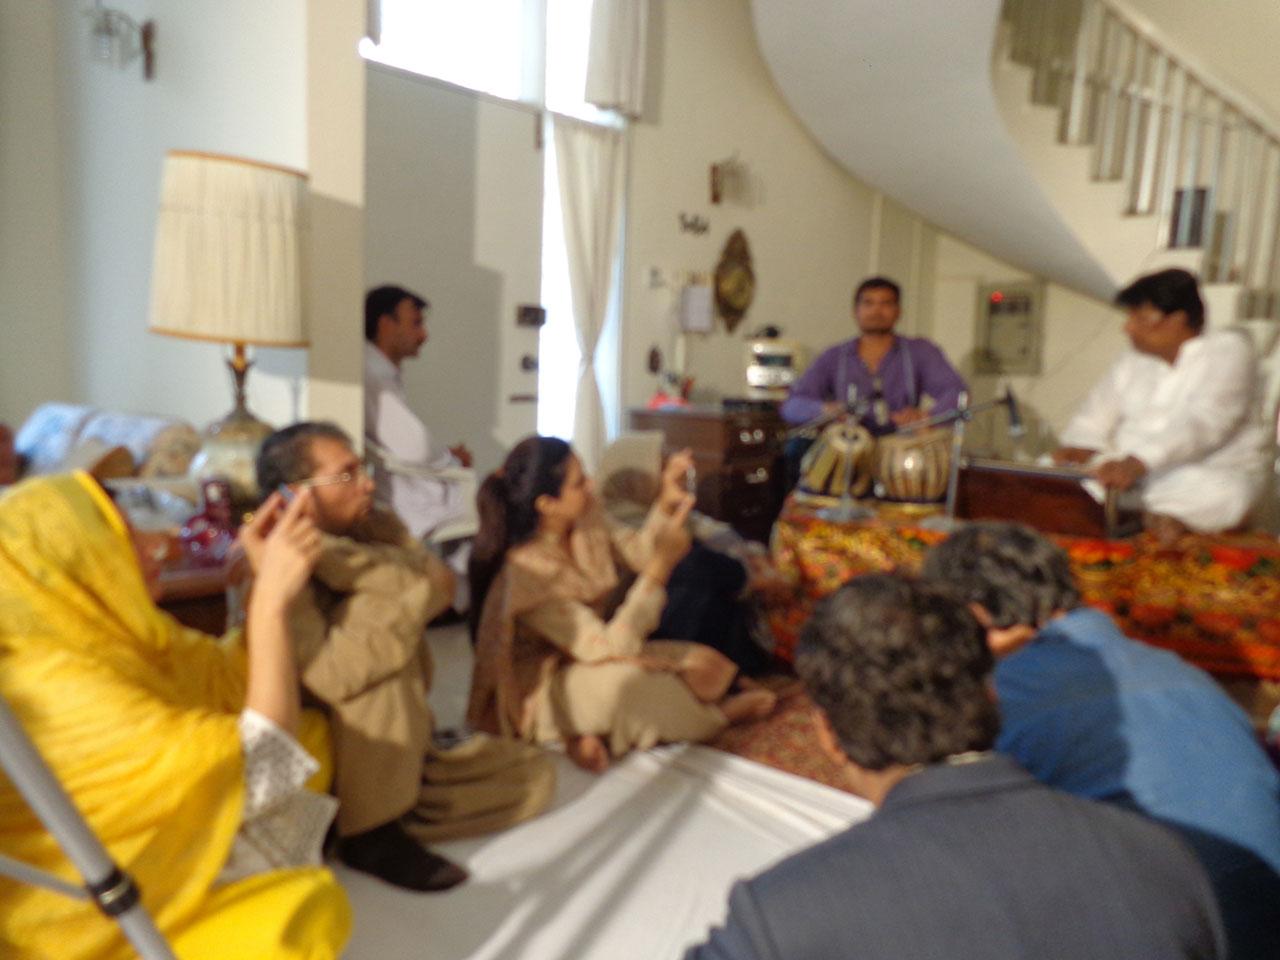 Almas Arif on Tabla and Ustad Yousuf Habib on Harmonium